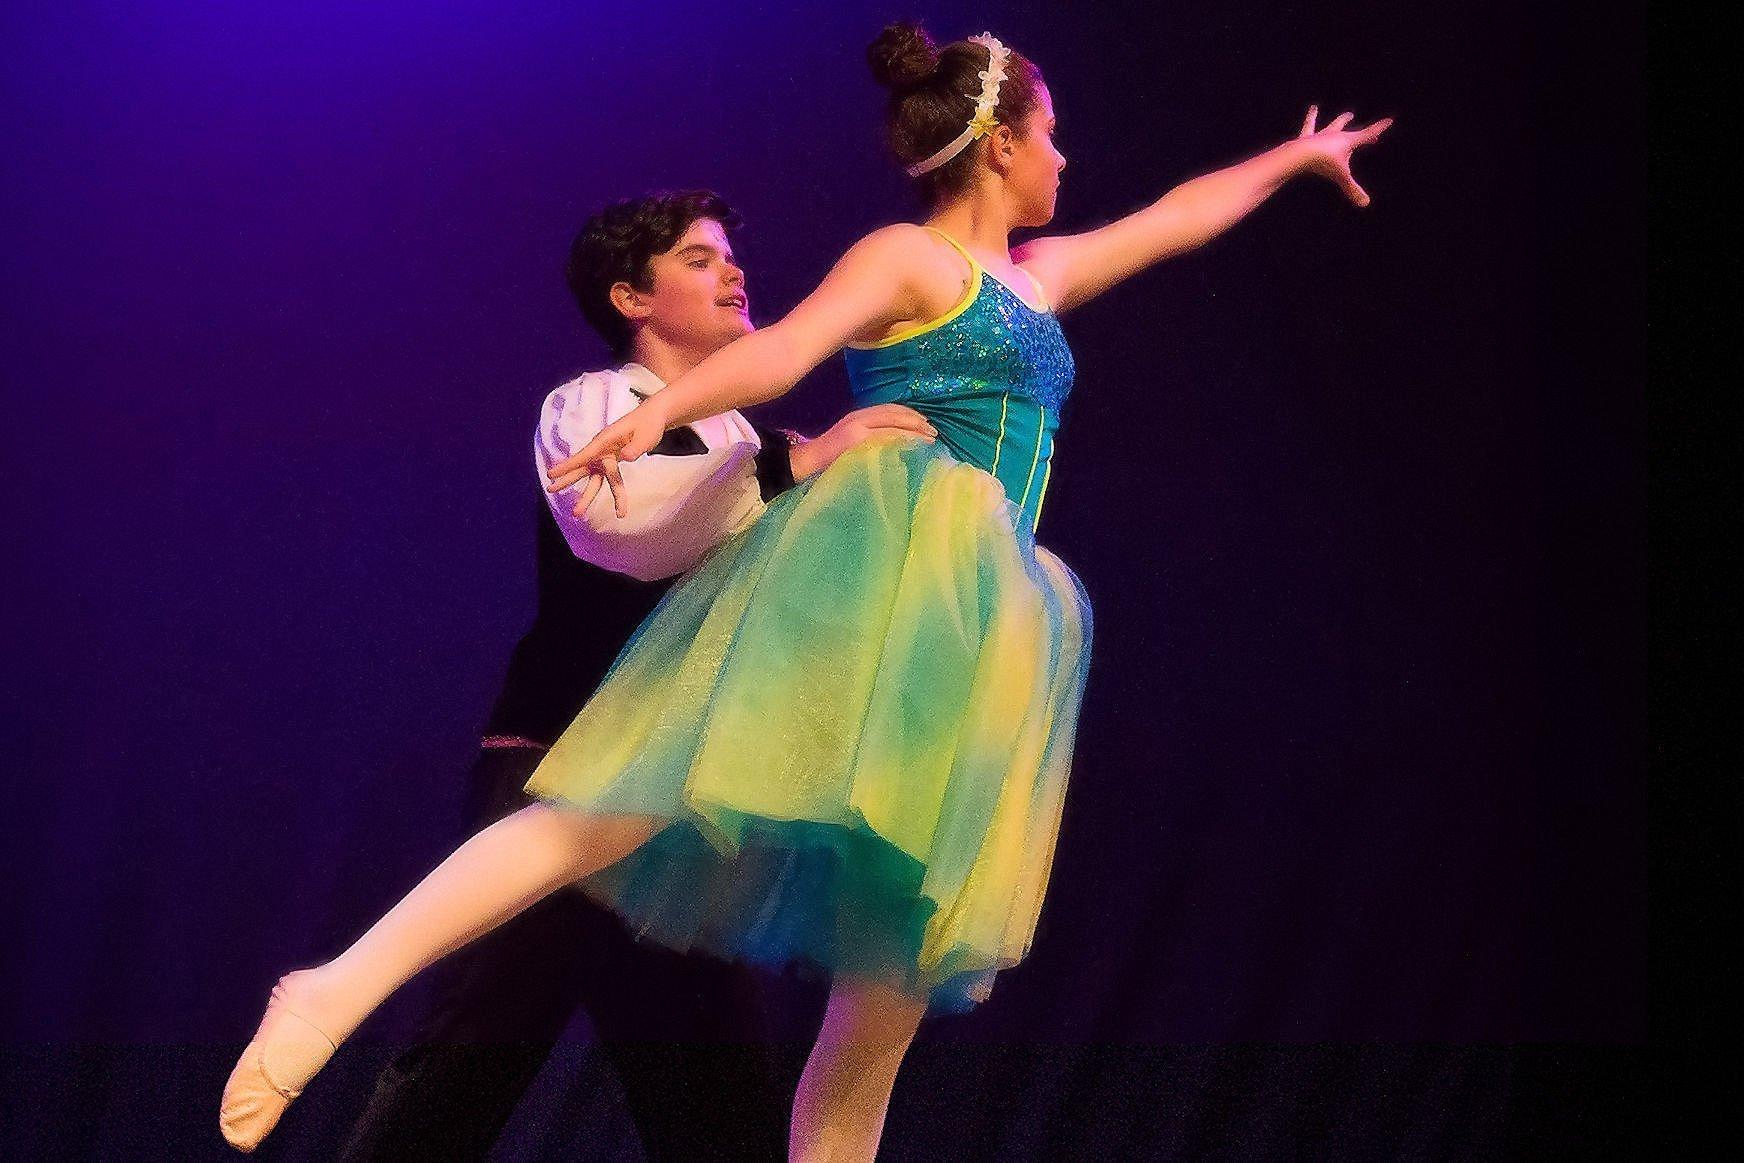 GD&PAA  Dance Styles: Tap; Ballet; Lyrical; Jazz; Funk & Rhythm Tap; Funk Jazz; Hip Hop; Contemporary; Modern